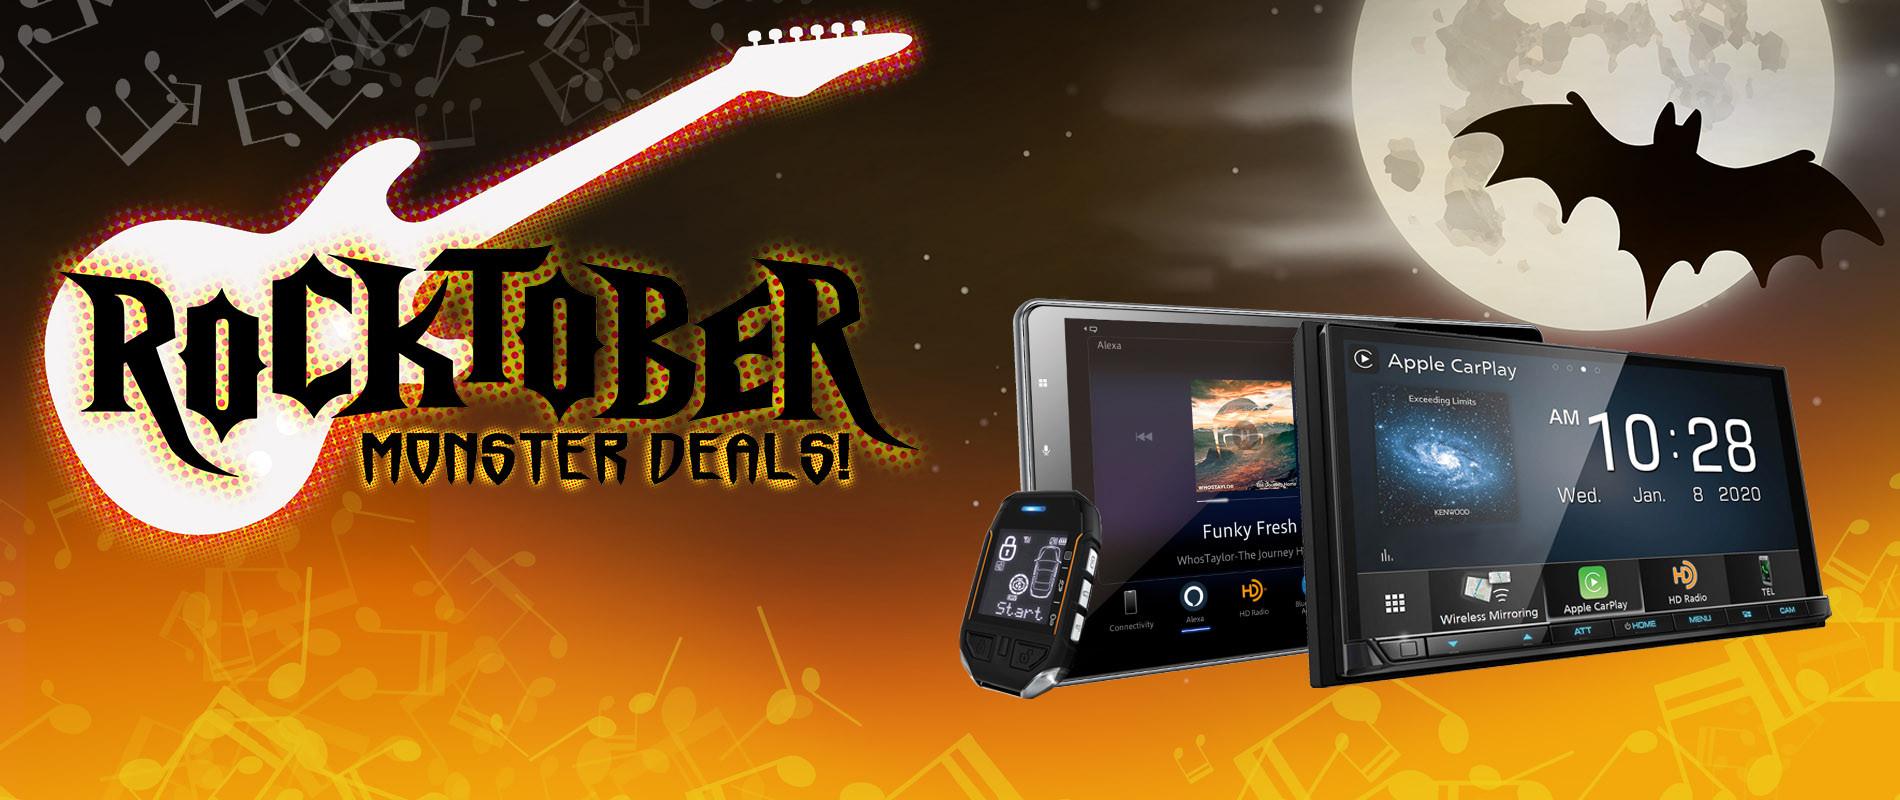 WebSlider_1900X800_Rocktober_2020.jpg